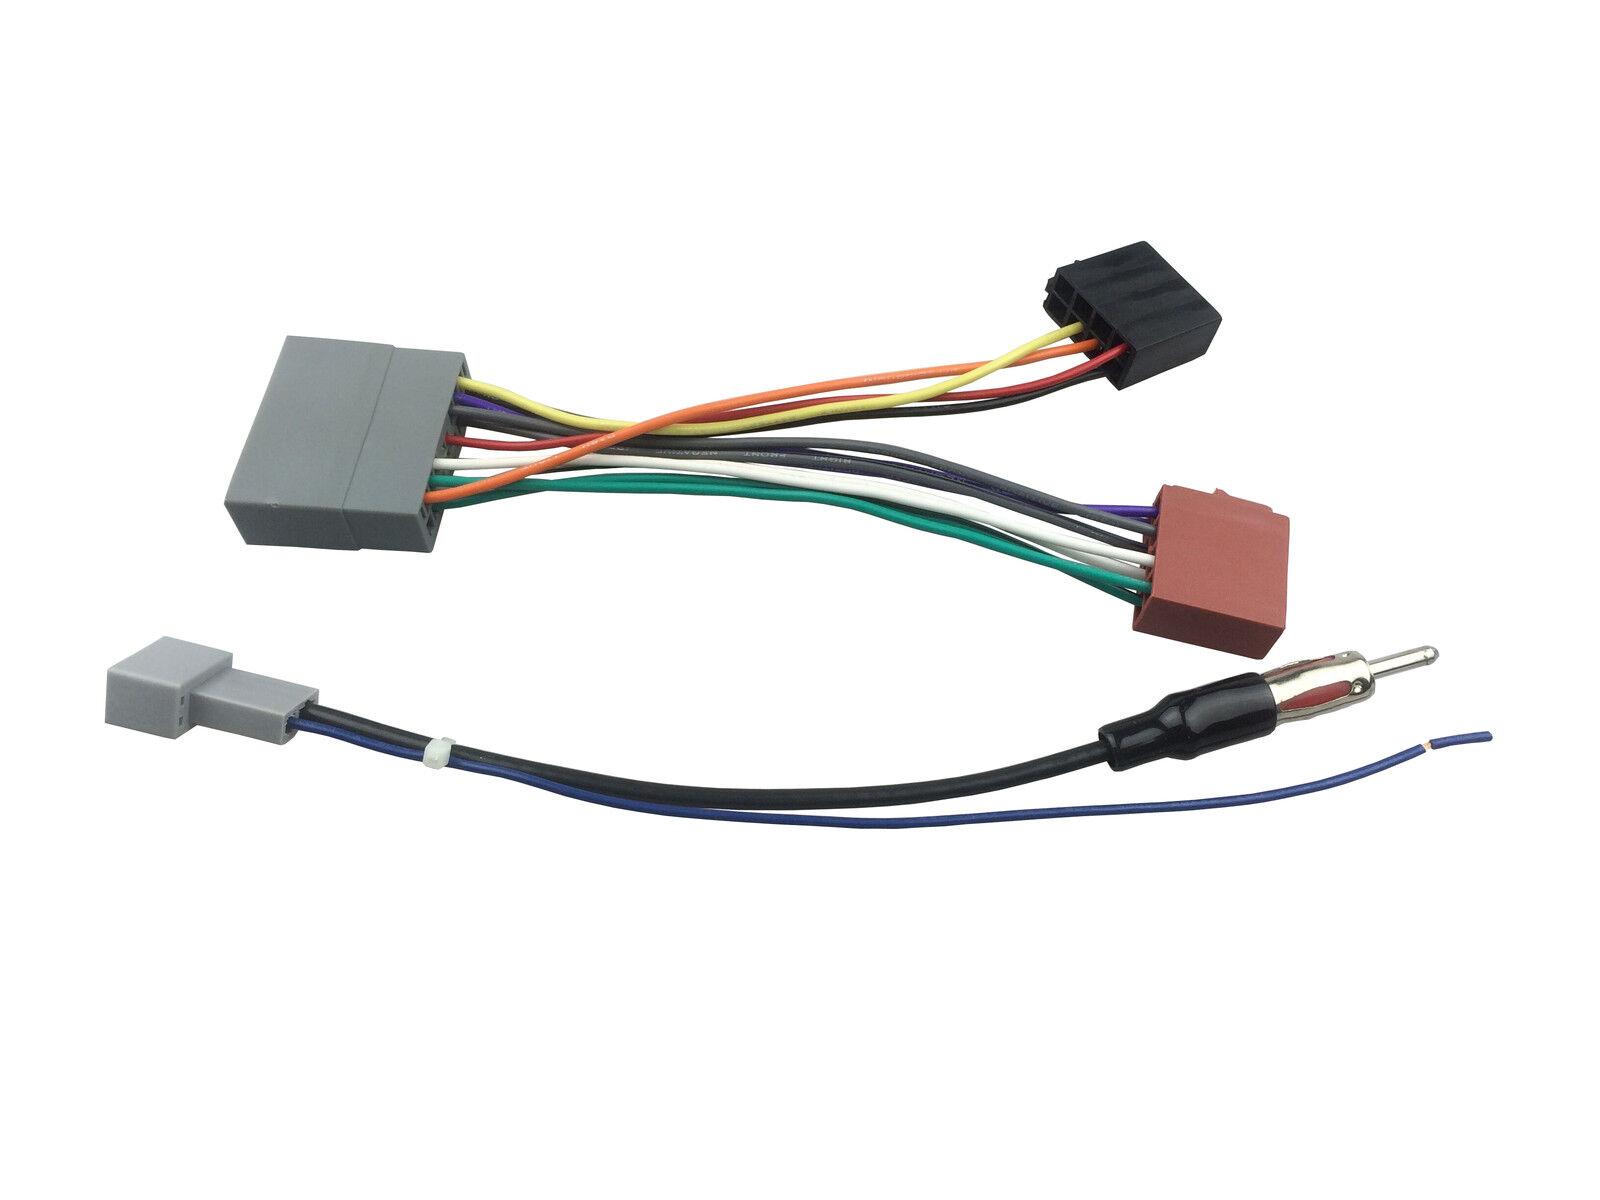 Radio Cable for Honda Civic 2006-2011 ISO Wiring Harness+Antenna Aerial Kit  | eBayeBay